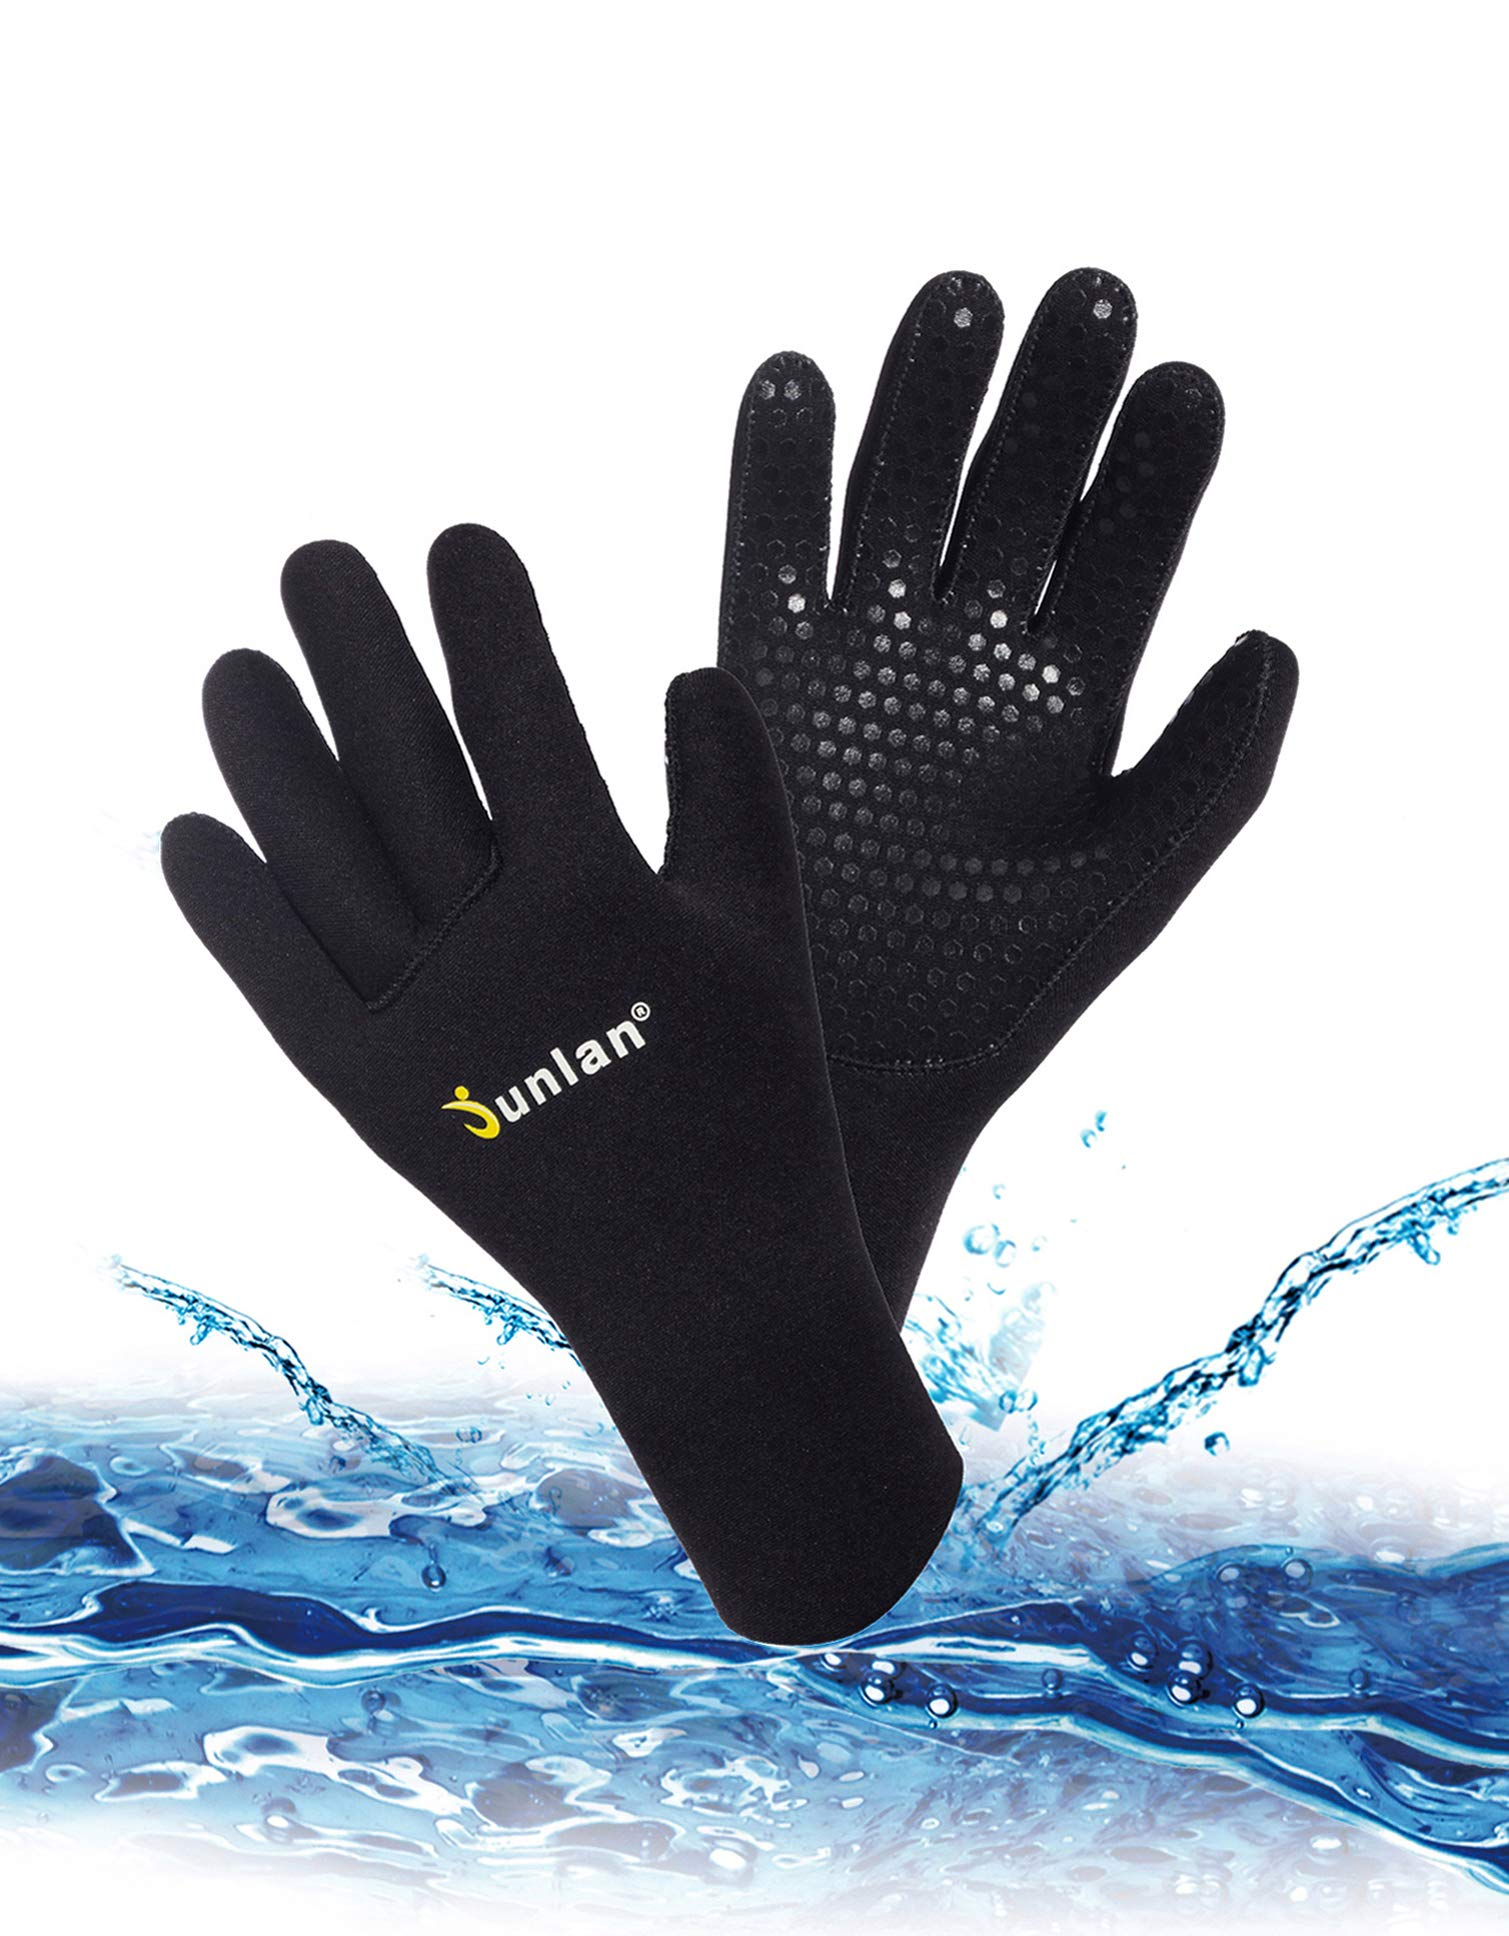 Junlan Neoprene Diving Gloves, Wetsuits Glove for Snorkeling, Kayaking, Water Jet Skiing, Sailing, Scuba Diving, Rafting (Black, XS/S) by Junlan